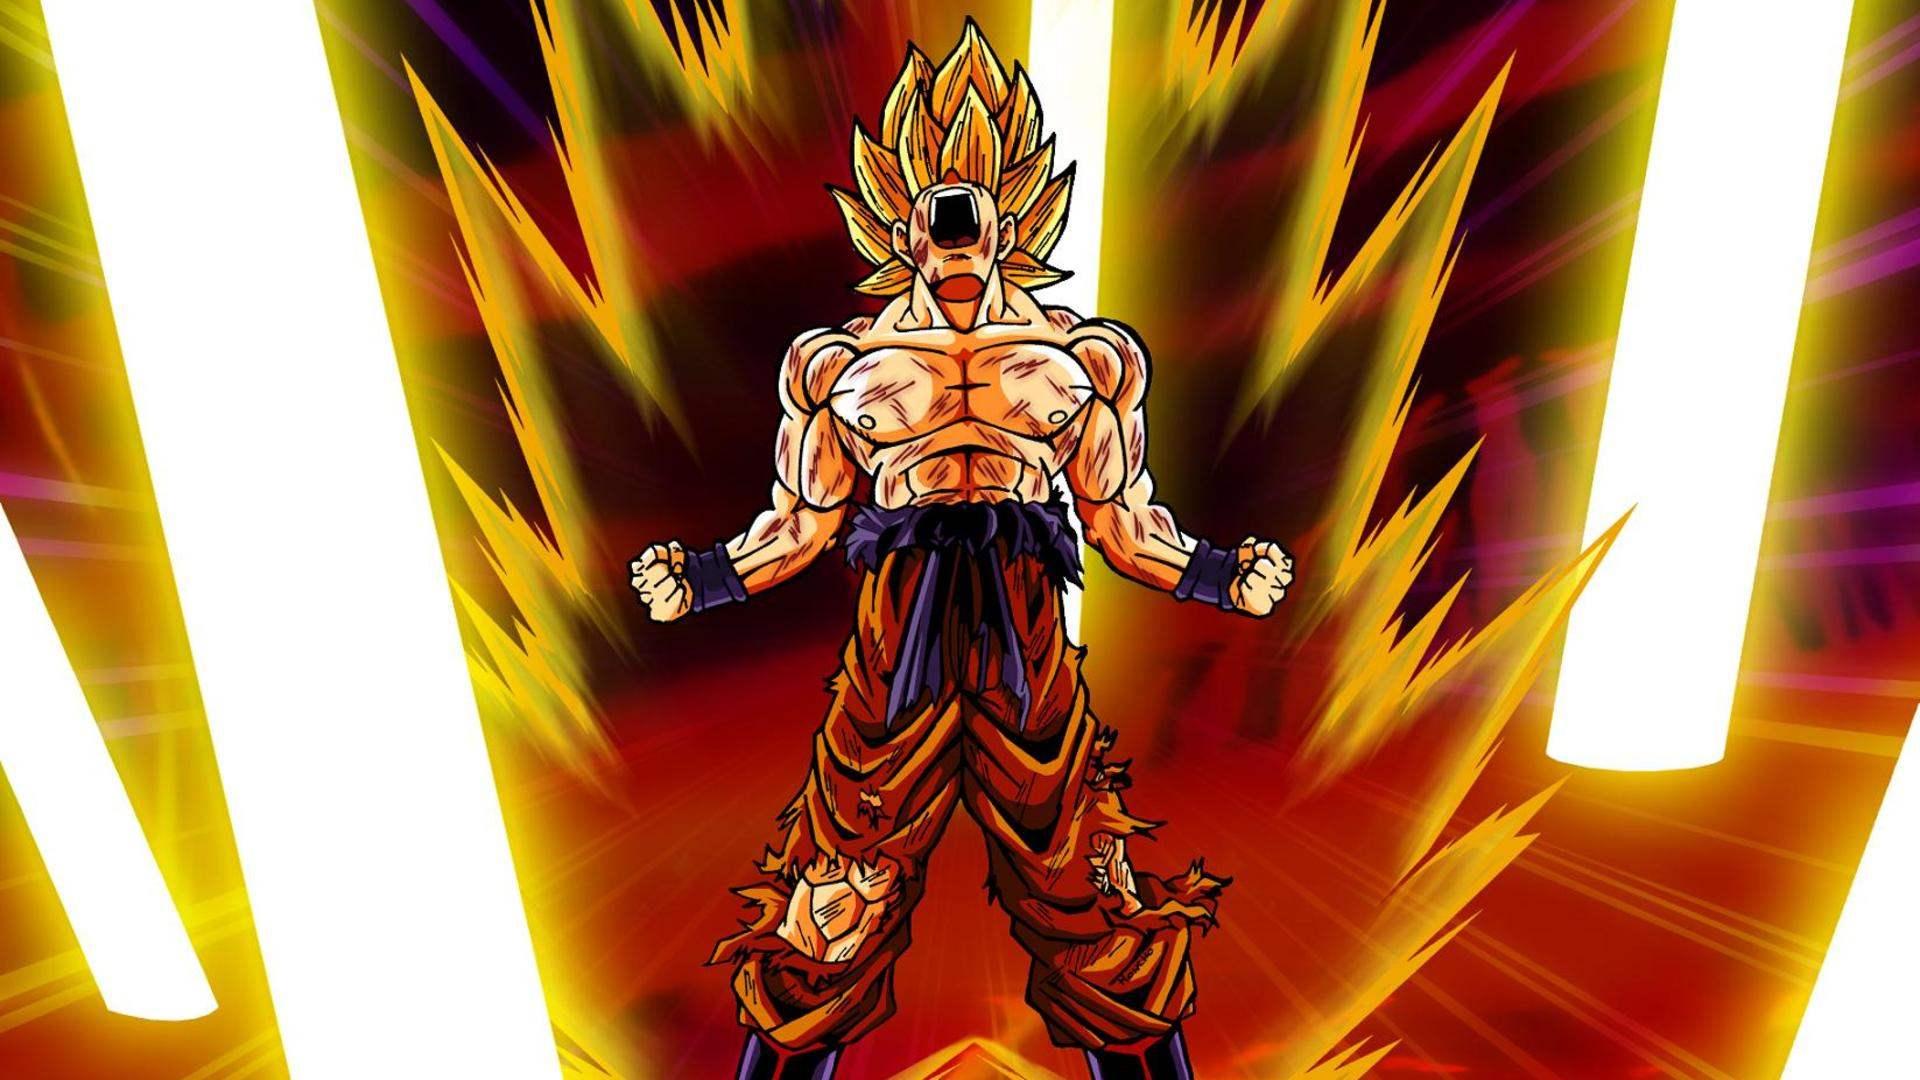 comDragon Ball Z Goku Super Saiyan 183 Hd Wallpapers in Cartoons 1920x1080